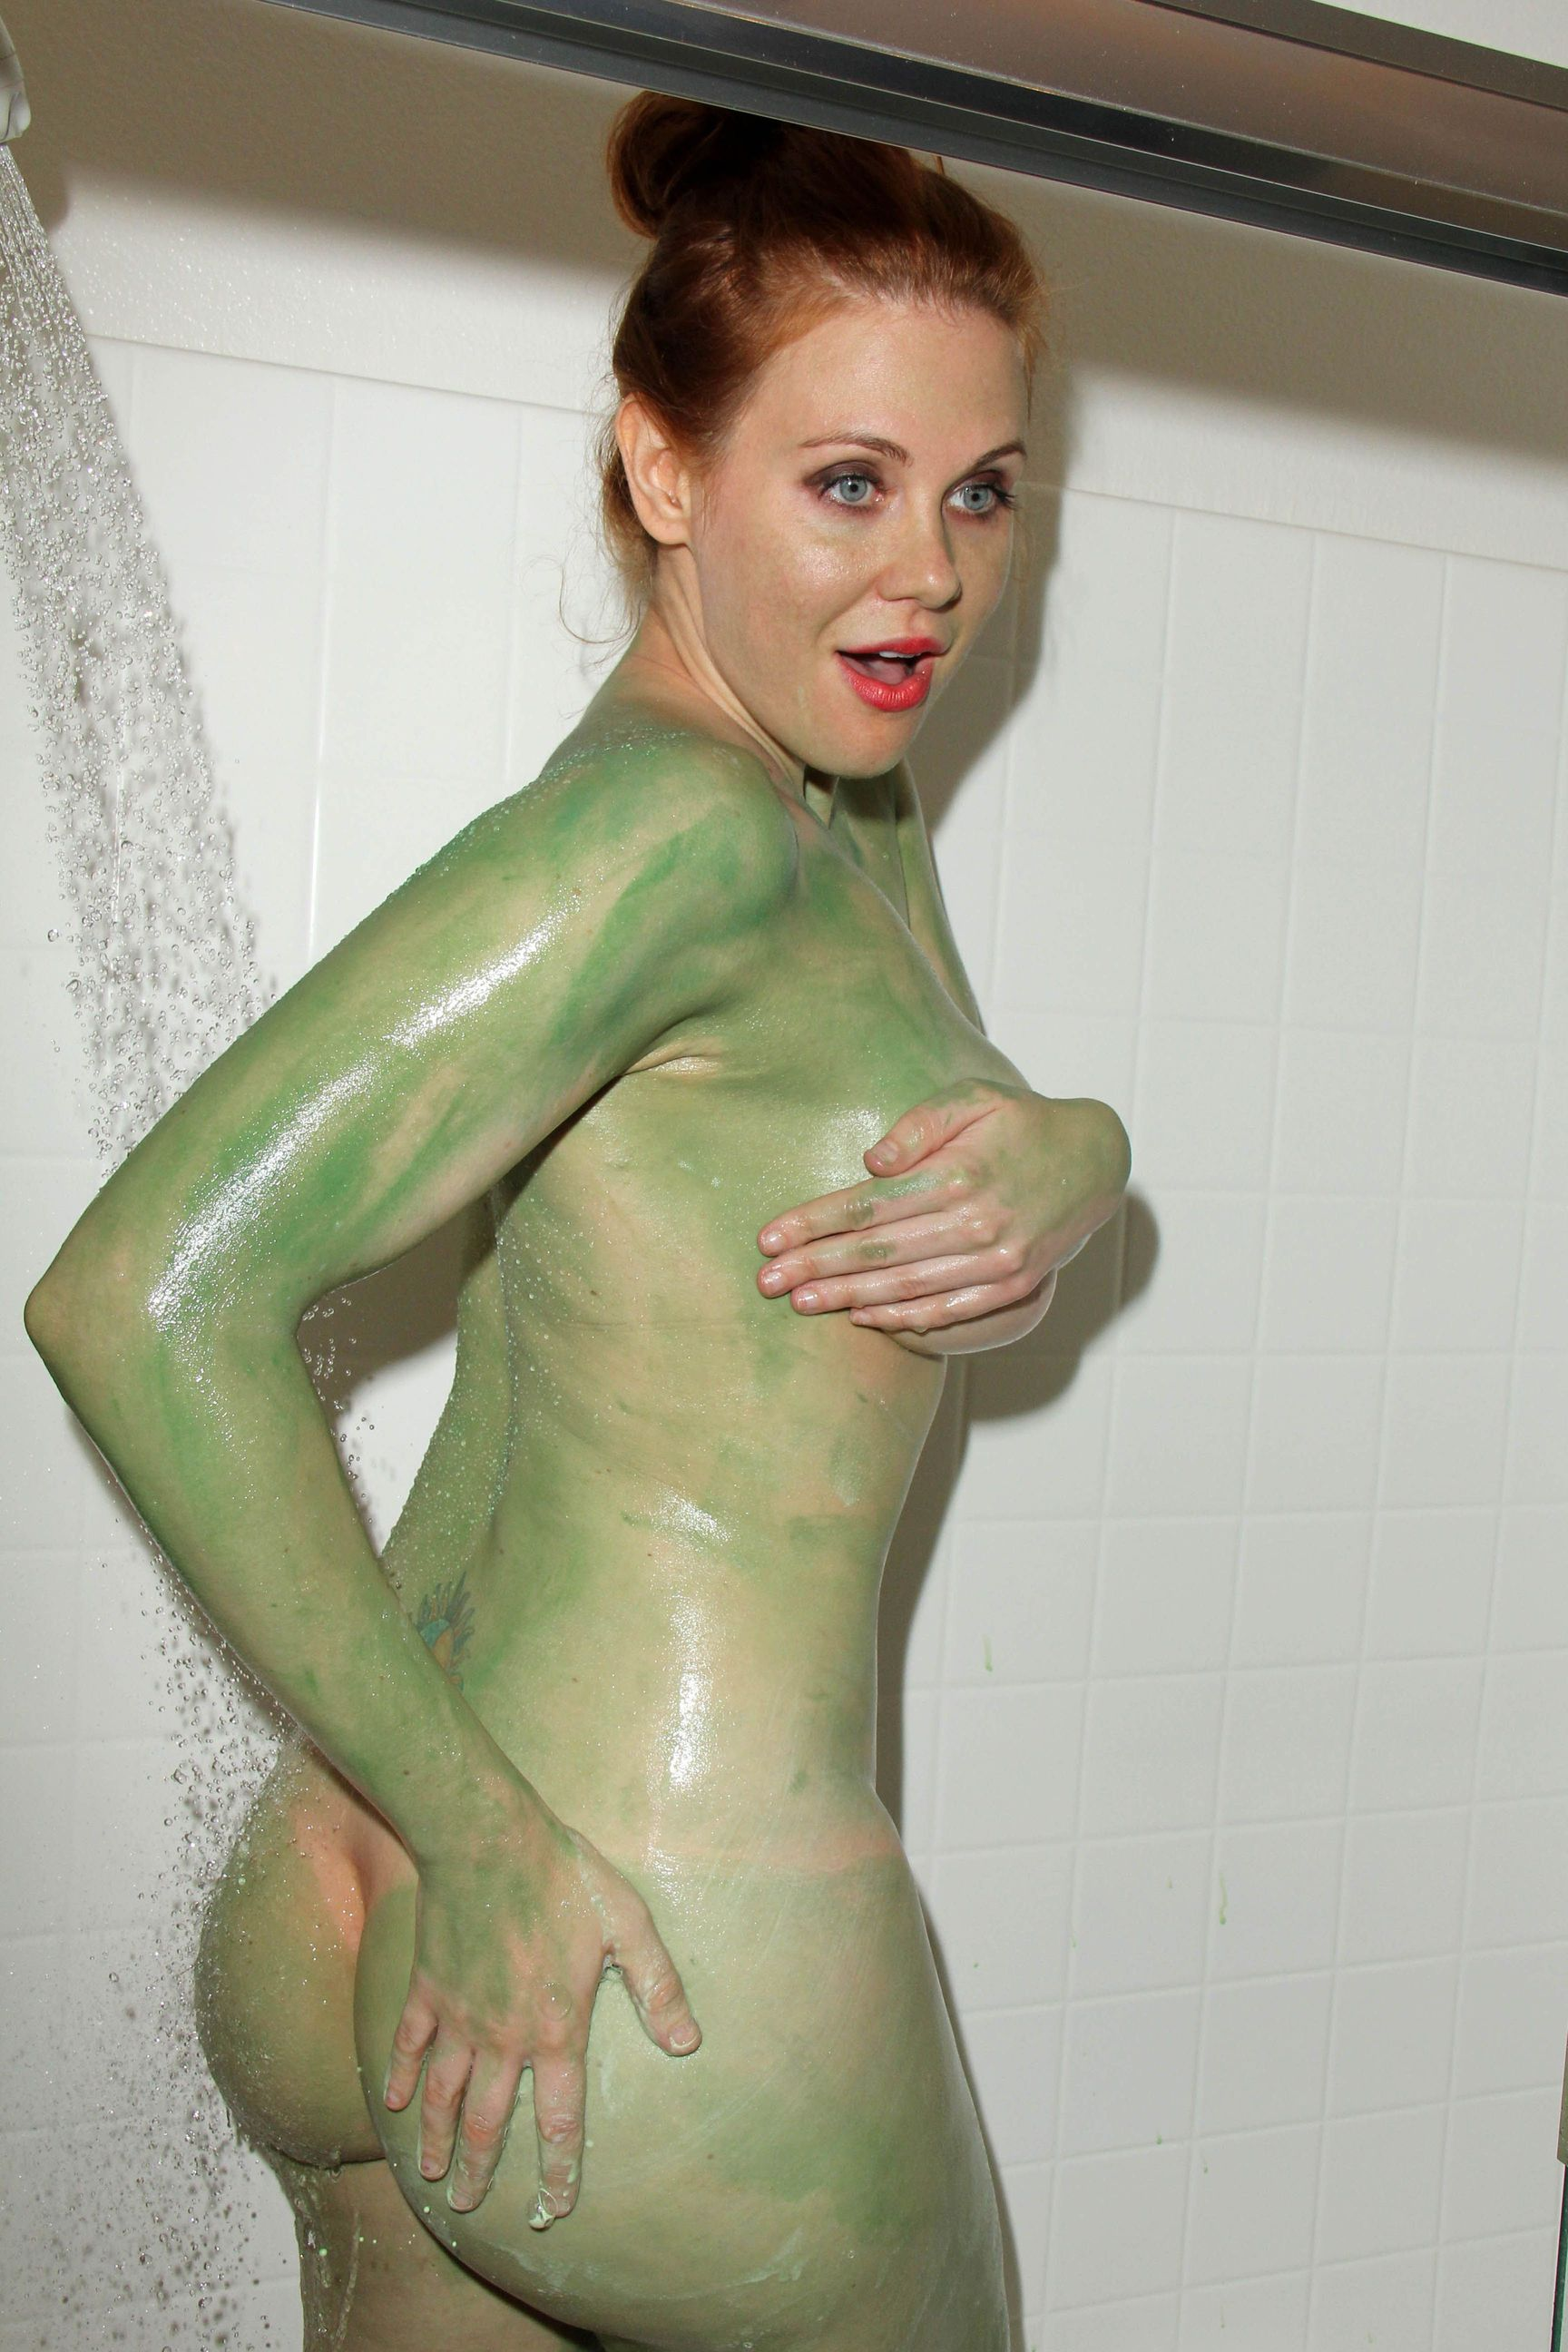 Naked Pics Of Maitland Wa...